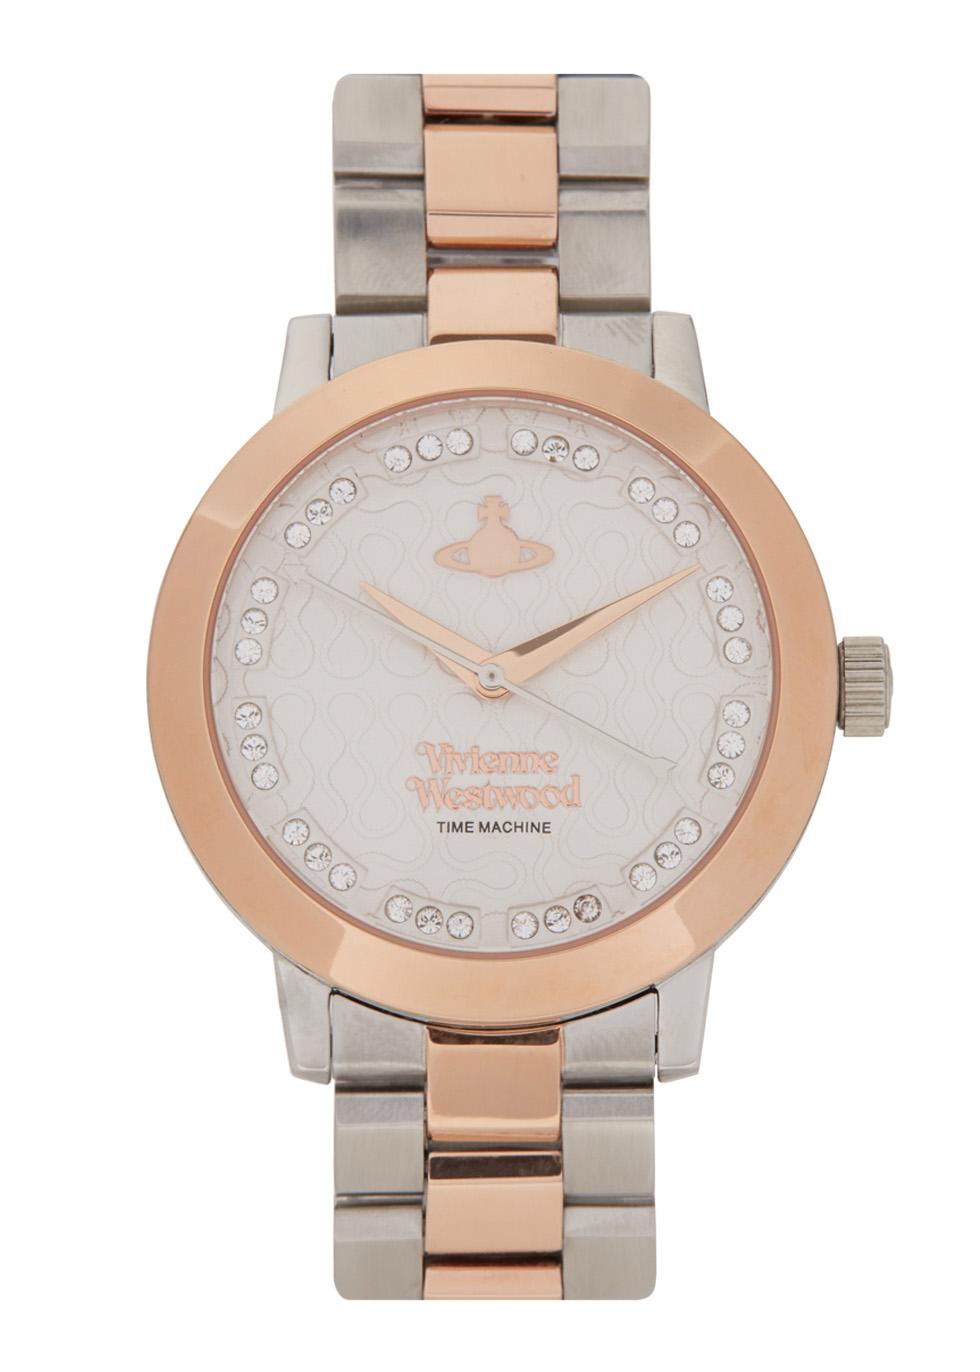 0a65c217603 Vivienne Westwood Portobello rose gold tone watch - Harvey Nichols